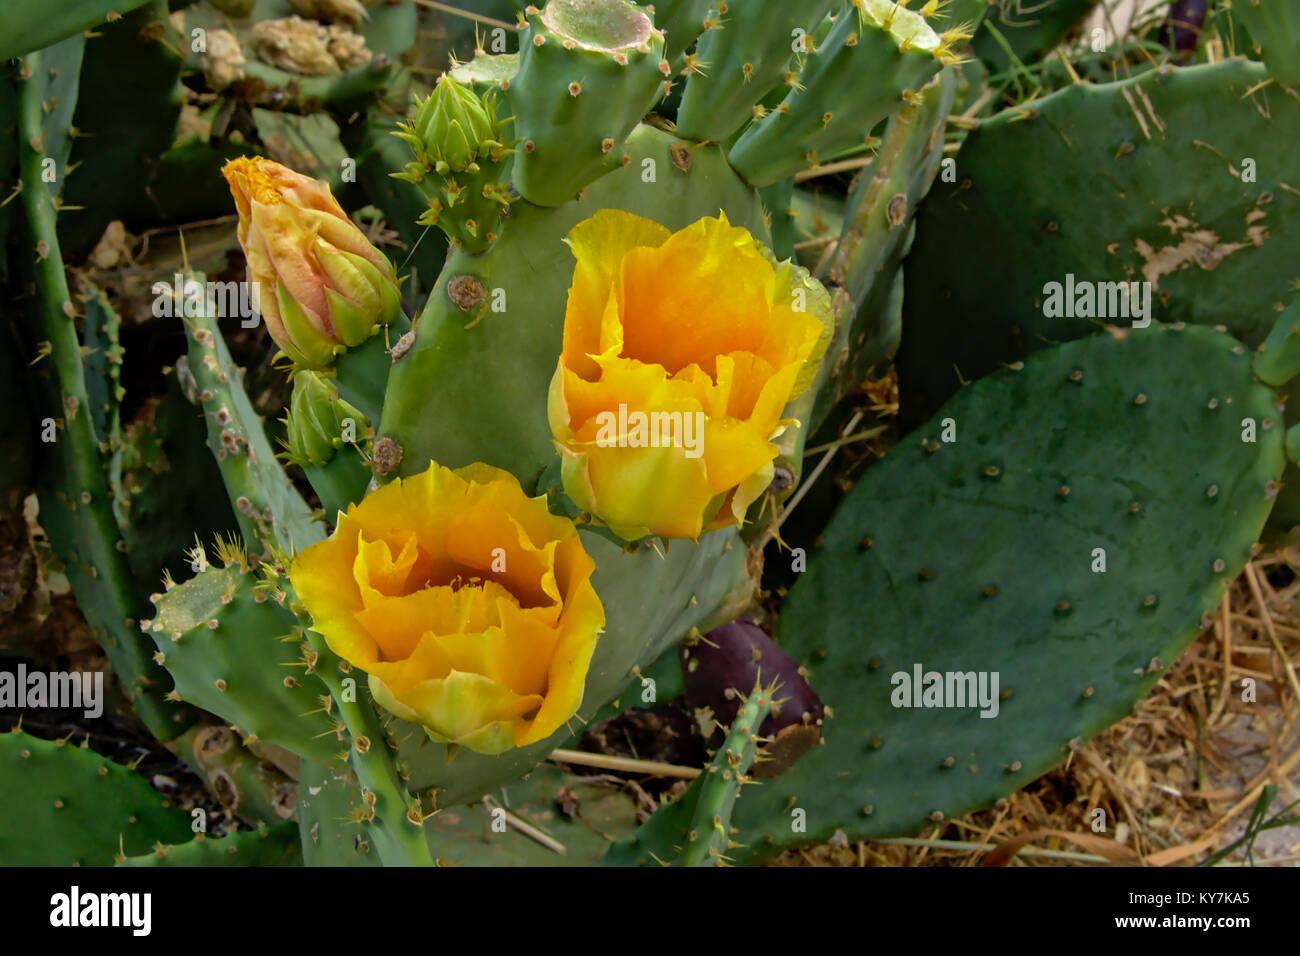 Yellow Flowering Cactus Stock Photos Yellow Flowering Cactus Stock